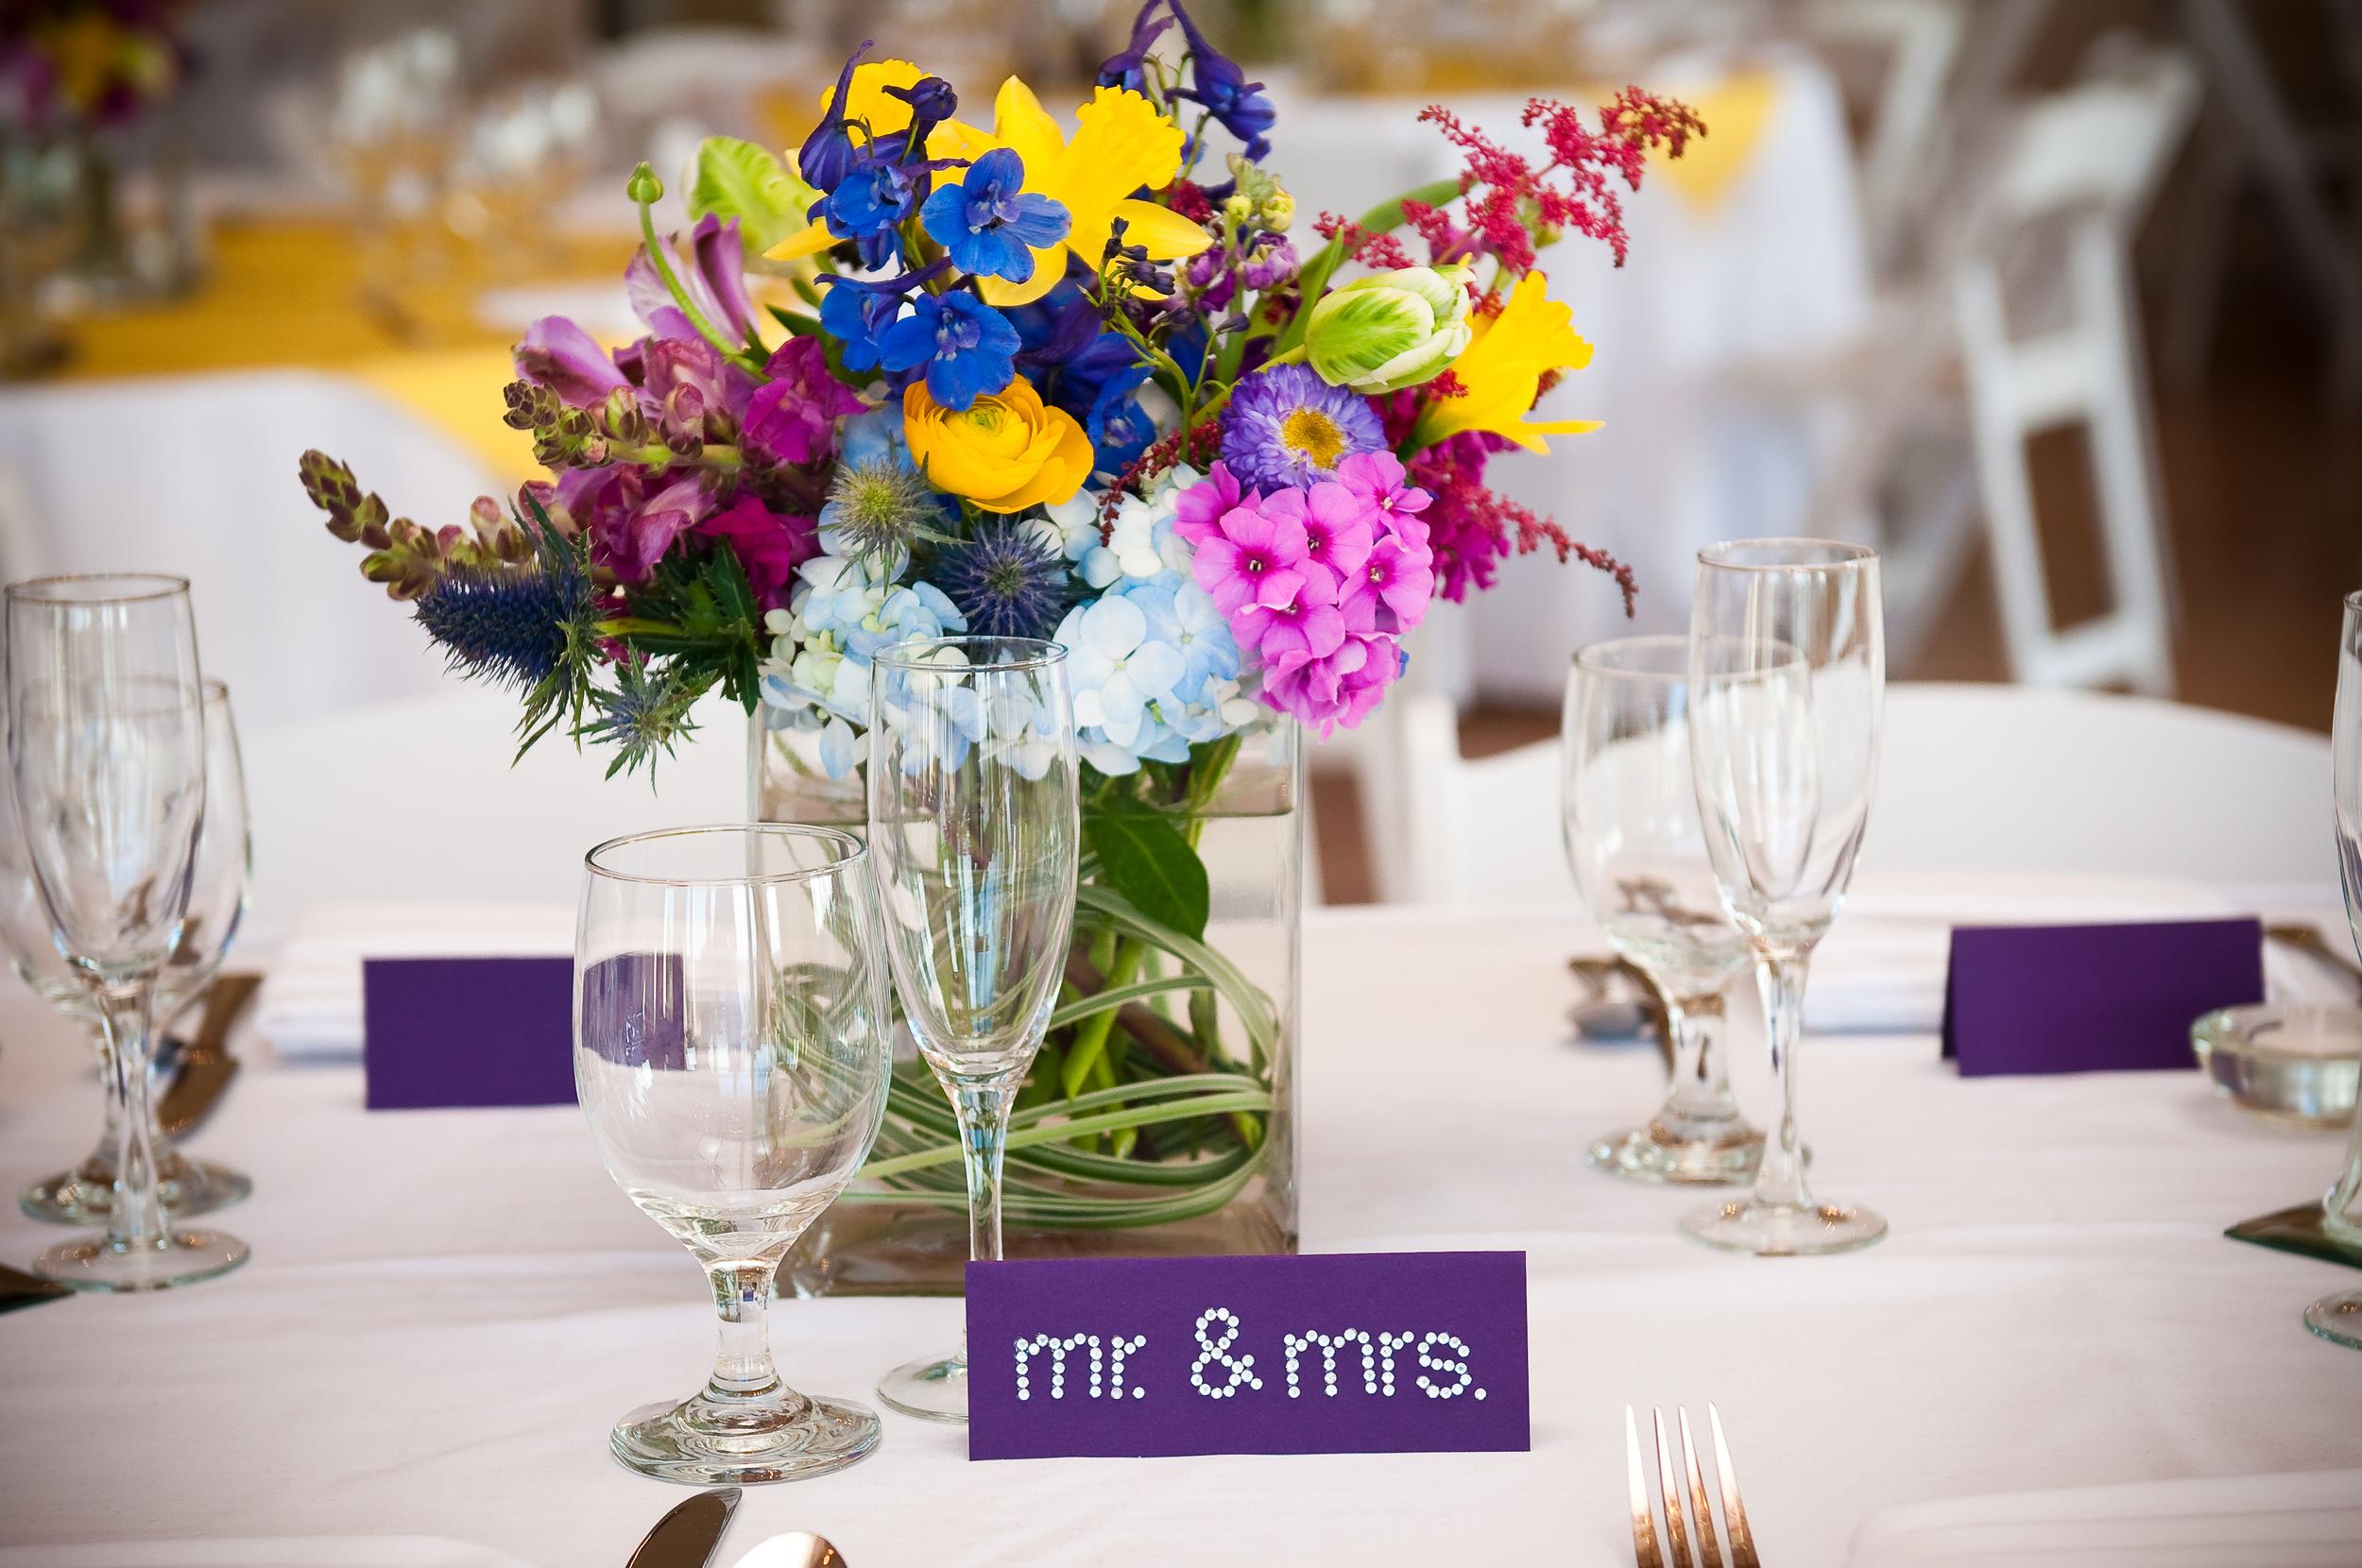 Wedding Centerpieces Mr. & Mrs. Sign Vintage Villas Loose Wildflowers